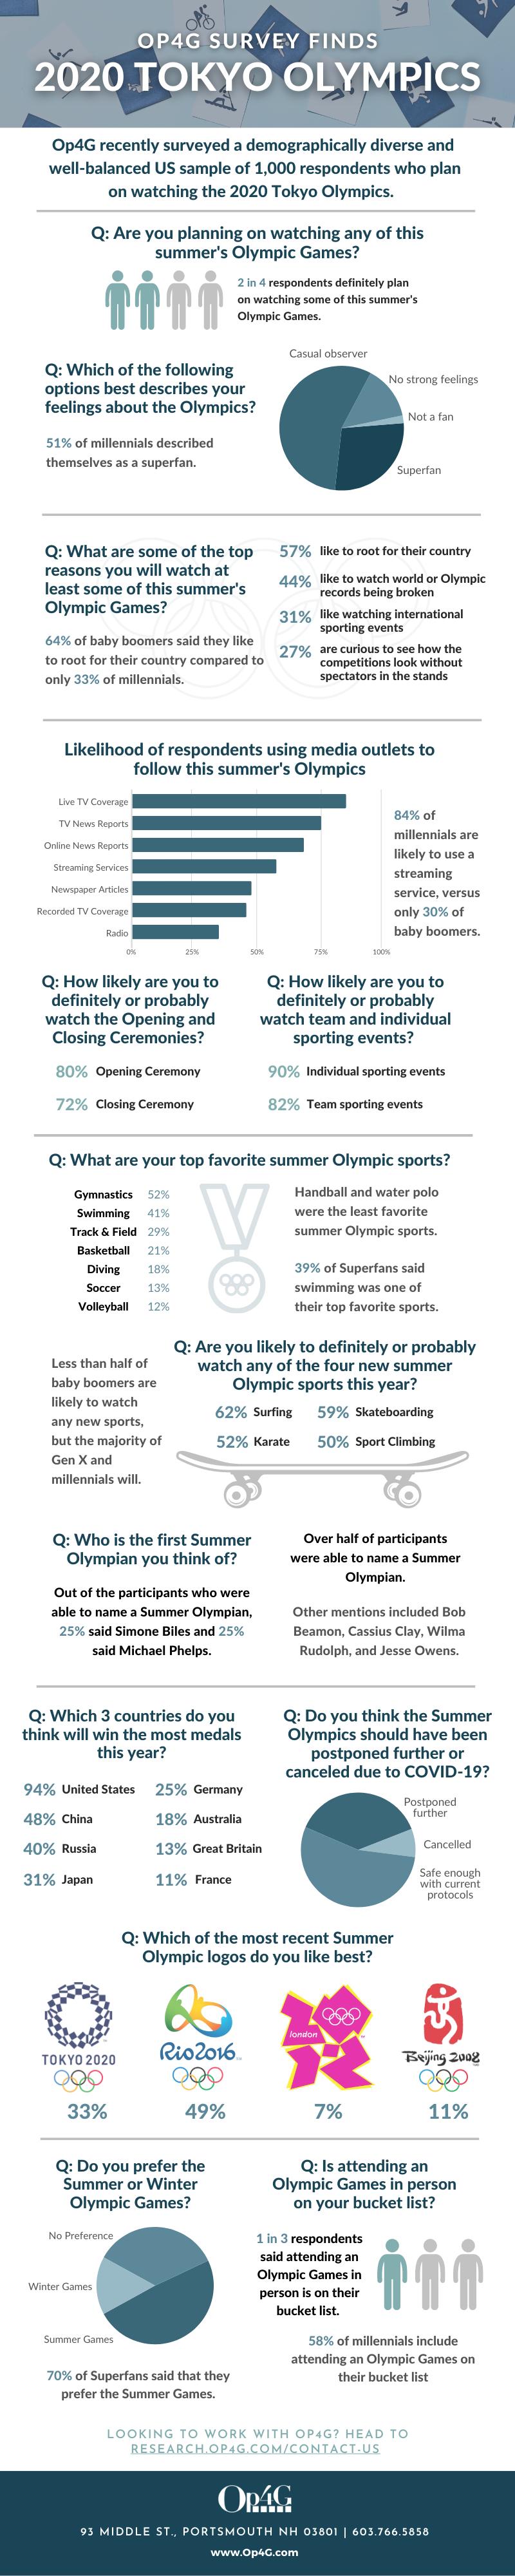 Op4G 2020 Olympics Survey (Infographic)